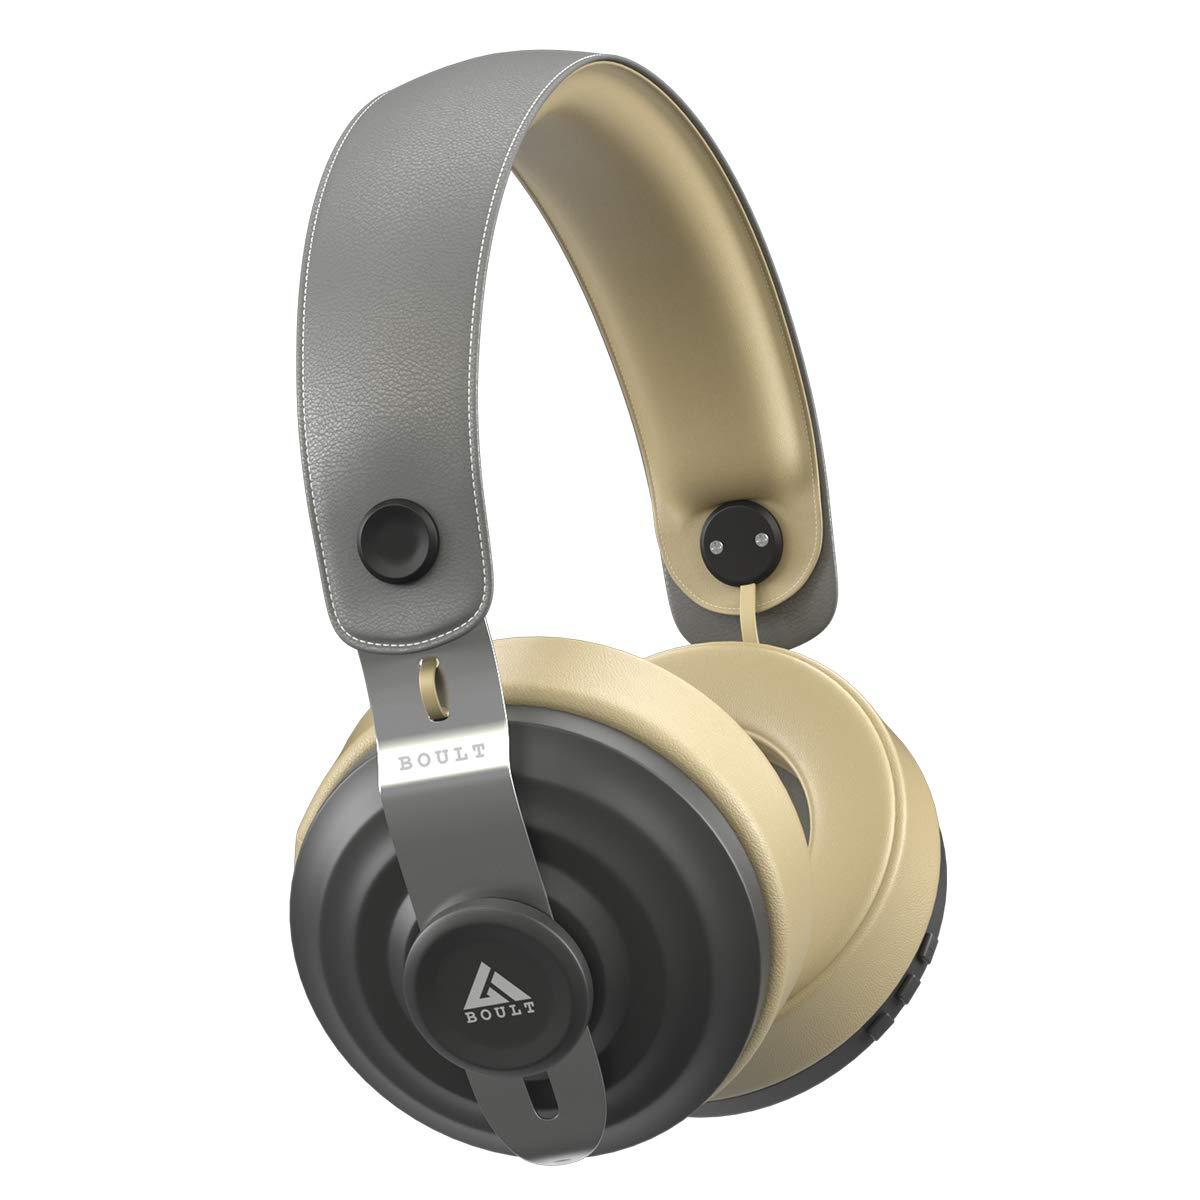 Boult Audio ProBass Boost Over-Ear Wireless Bluetooth Headphone